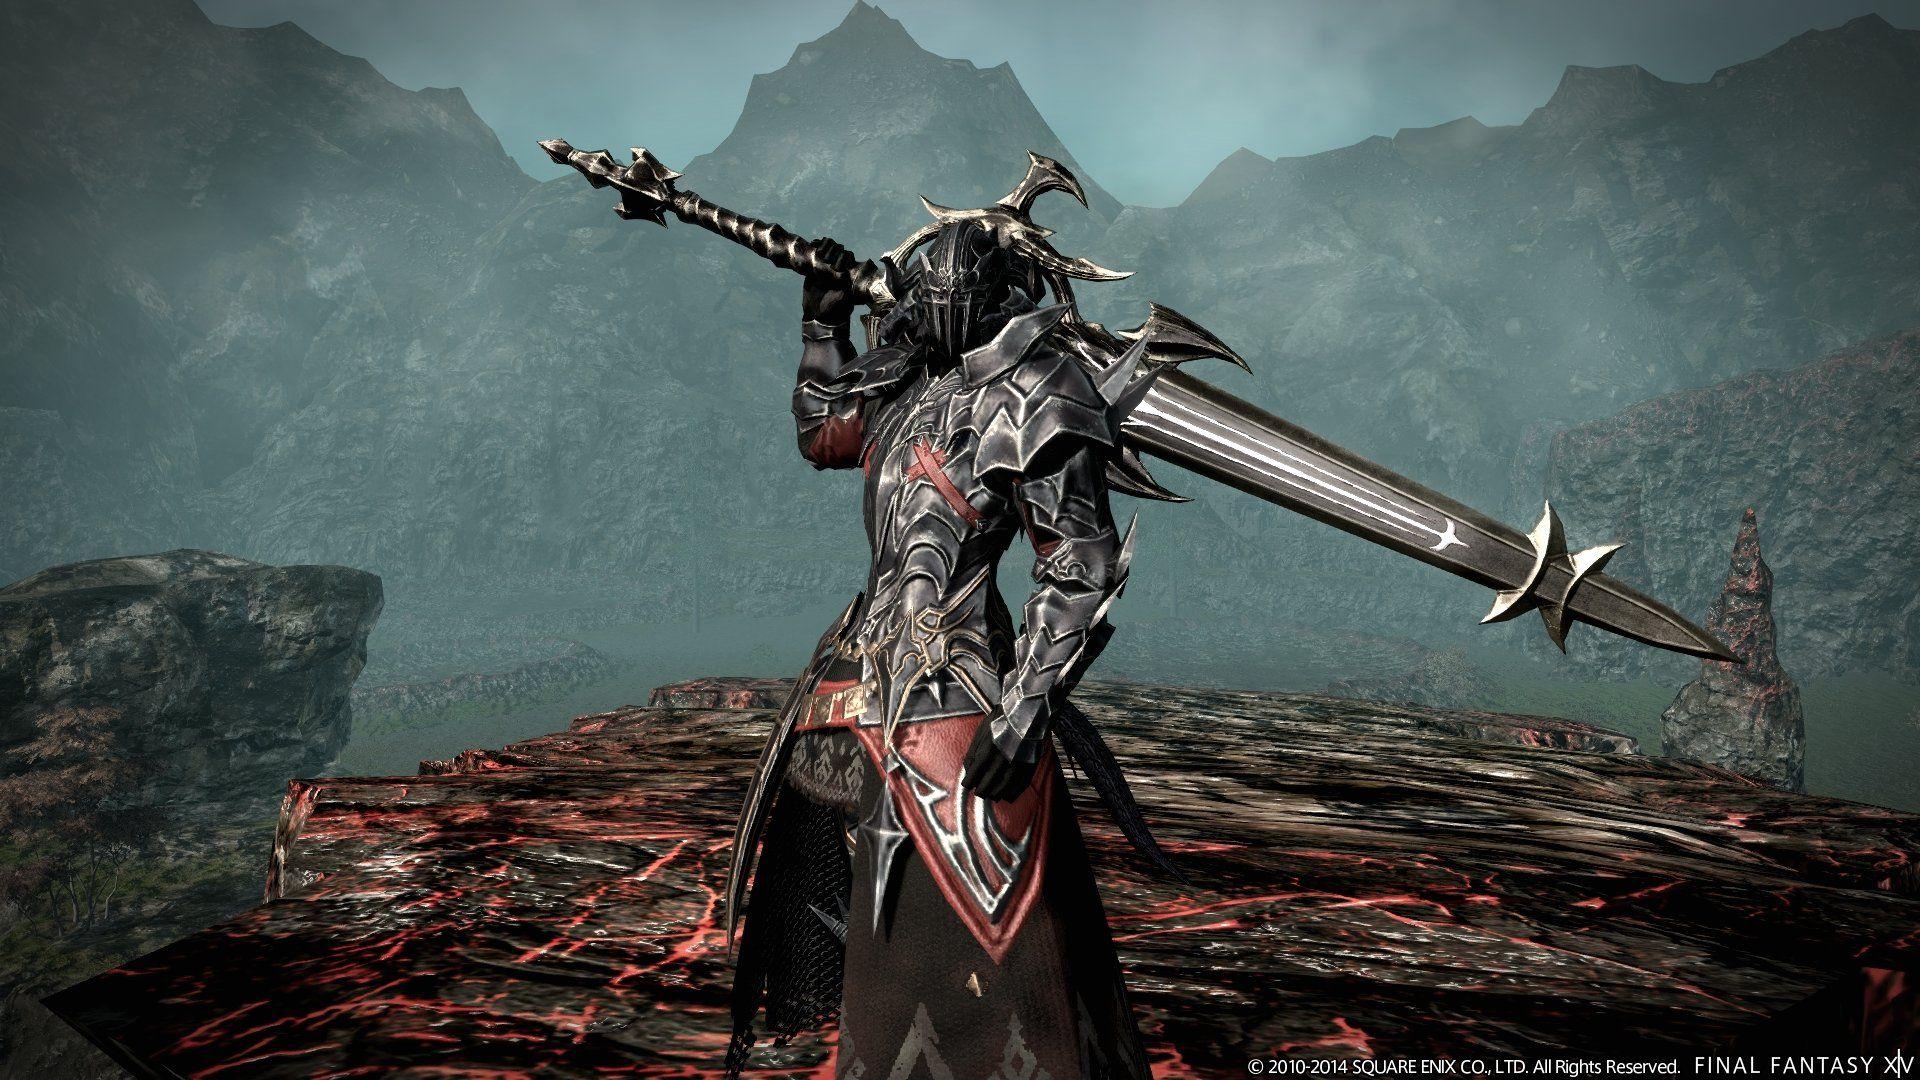 Ffxiv Dark Knight Wallpaper Wallpapersafari Final Fantasy Xiv